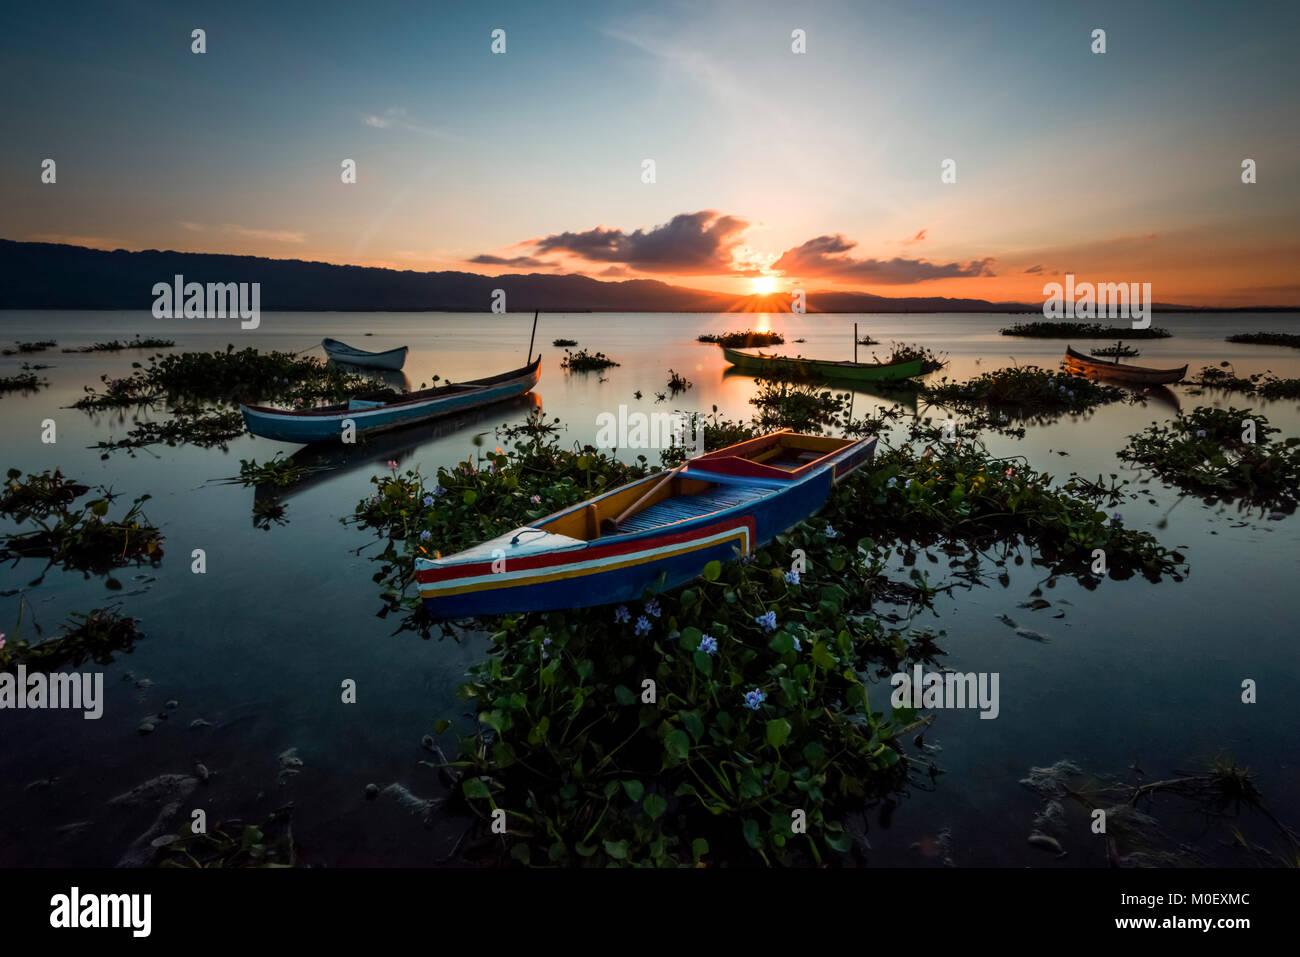 Boote auf limboto See bei Sonnenuntergang, Gorontalo, Indonesien Stockbild